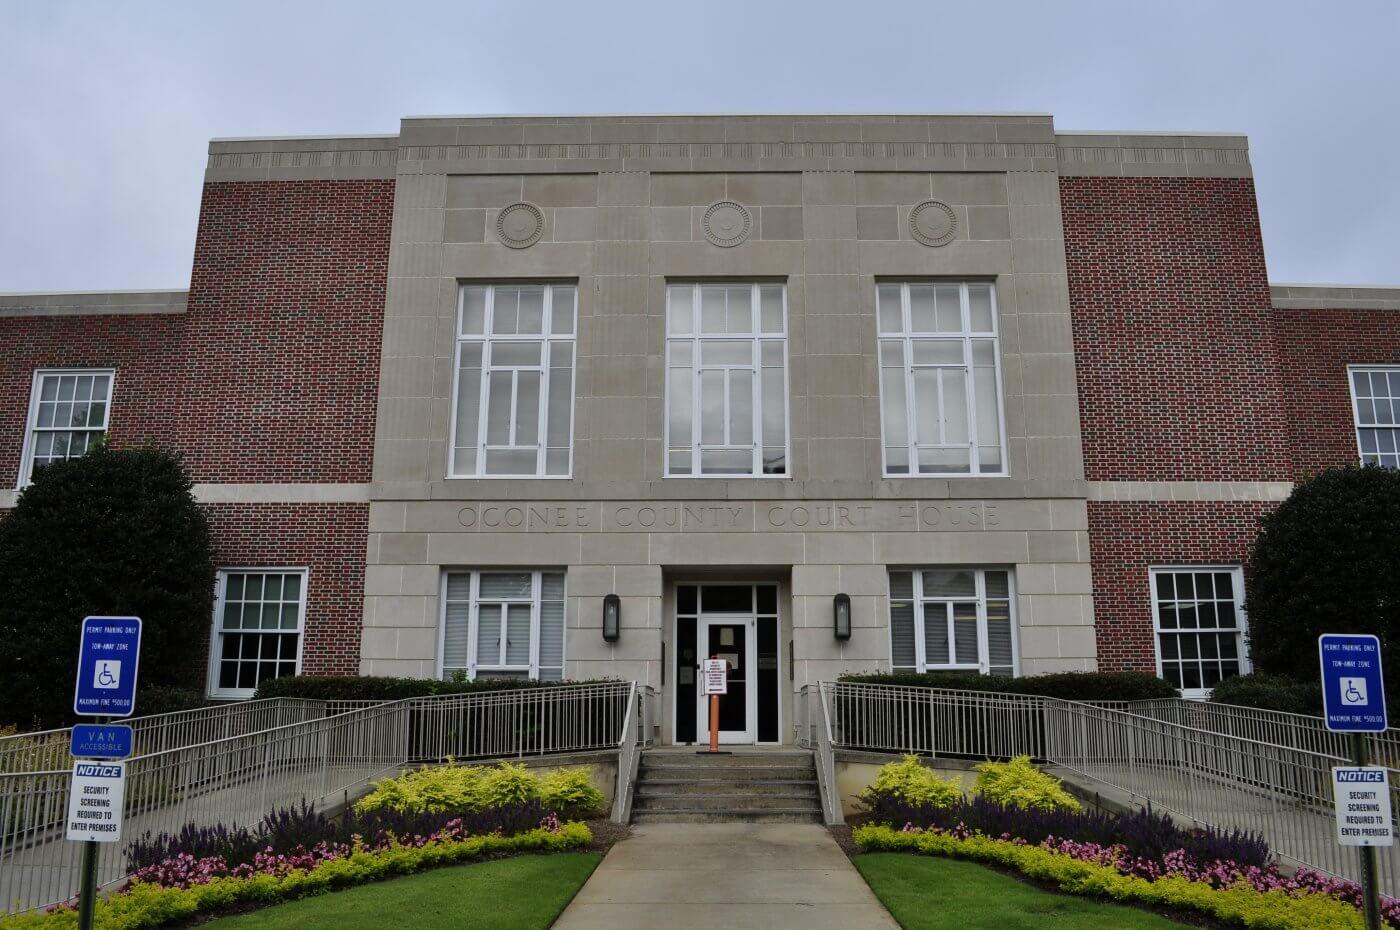 Watkinsville pest control building